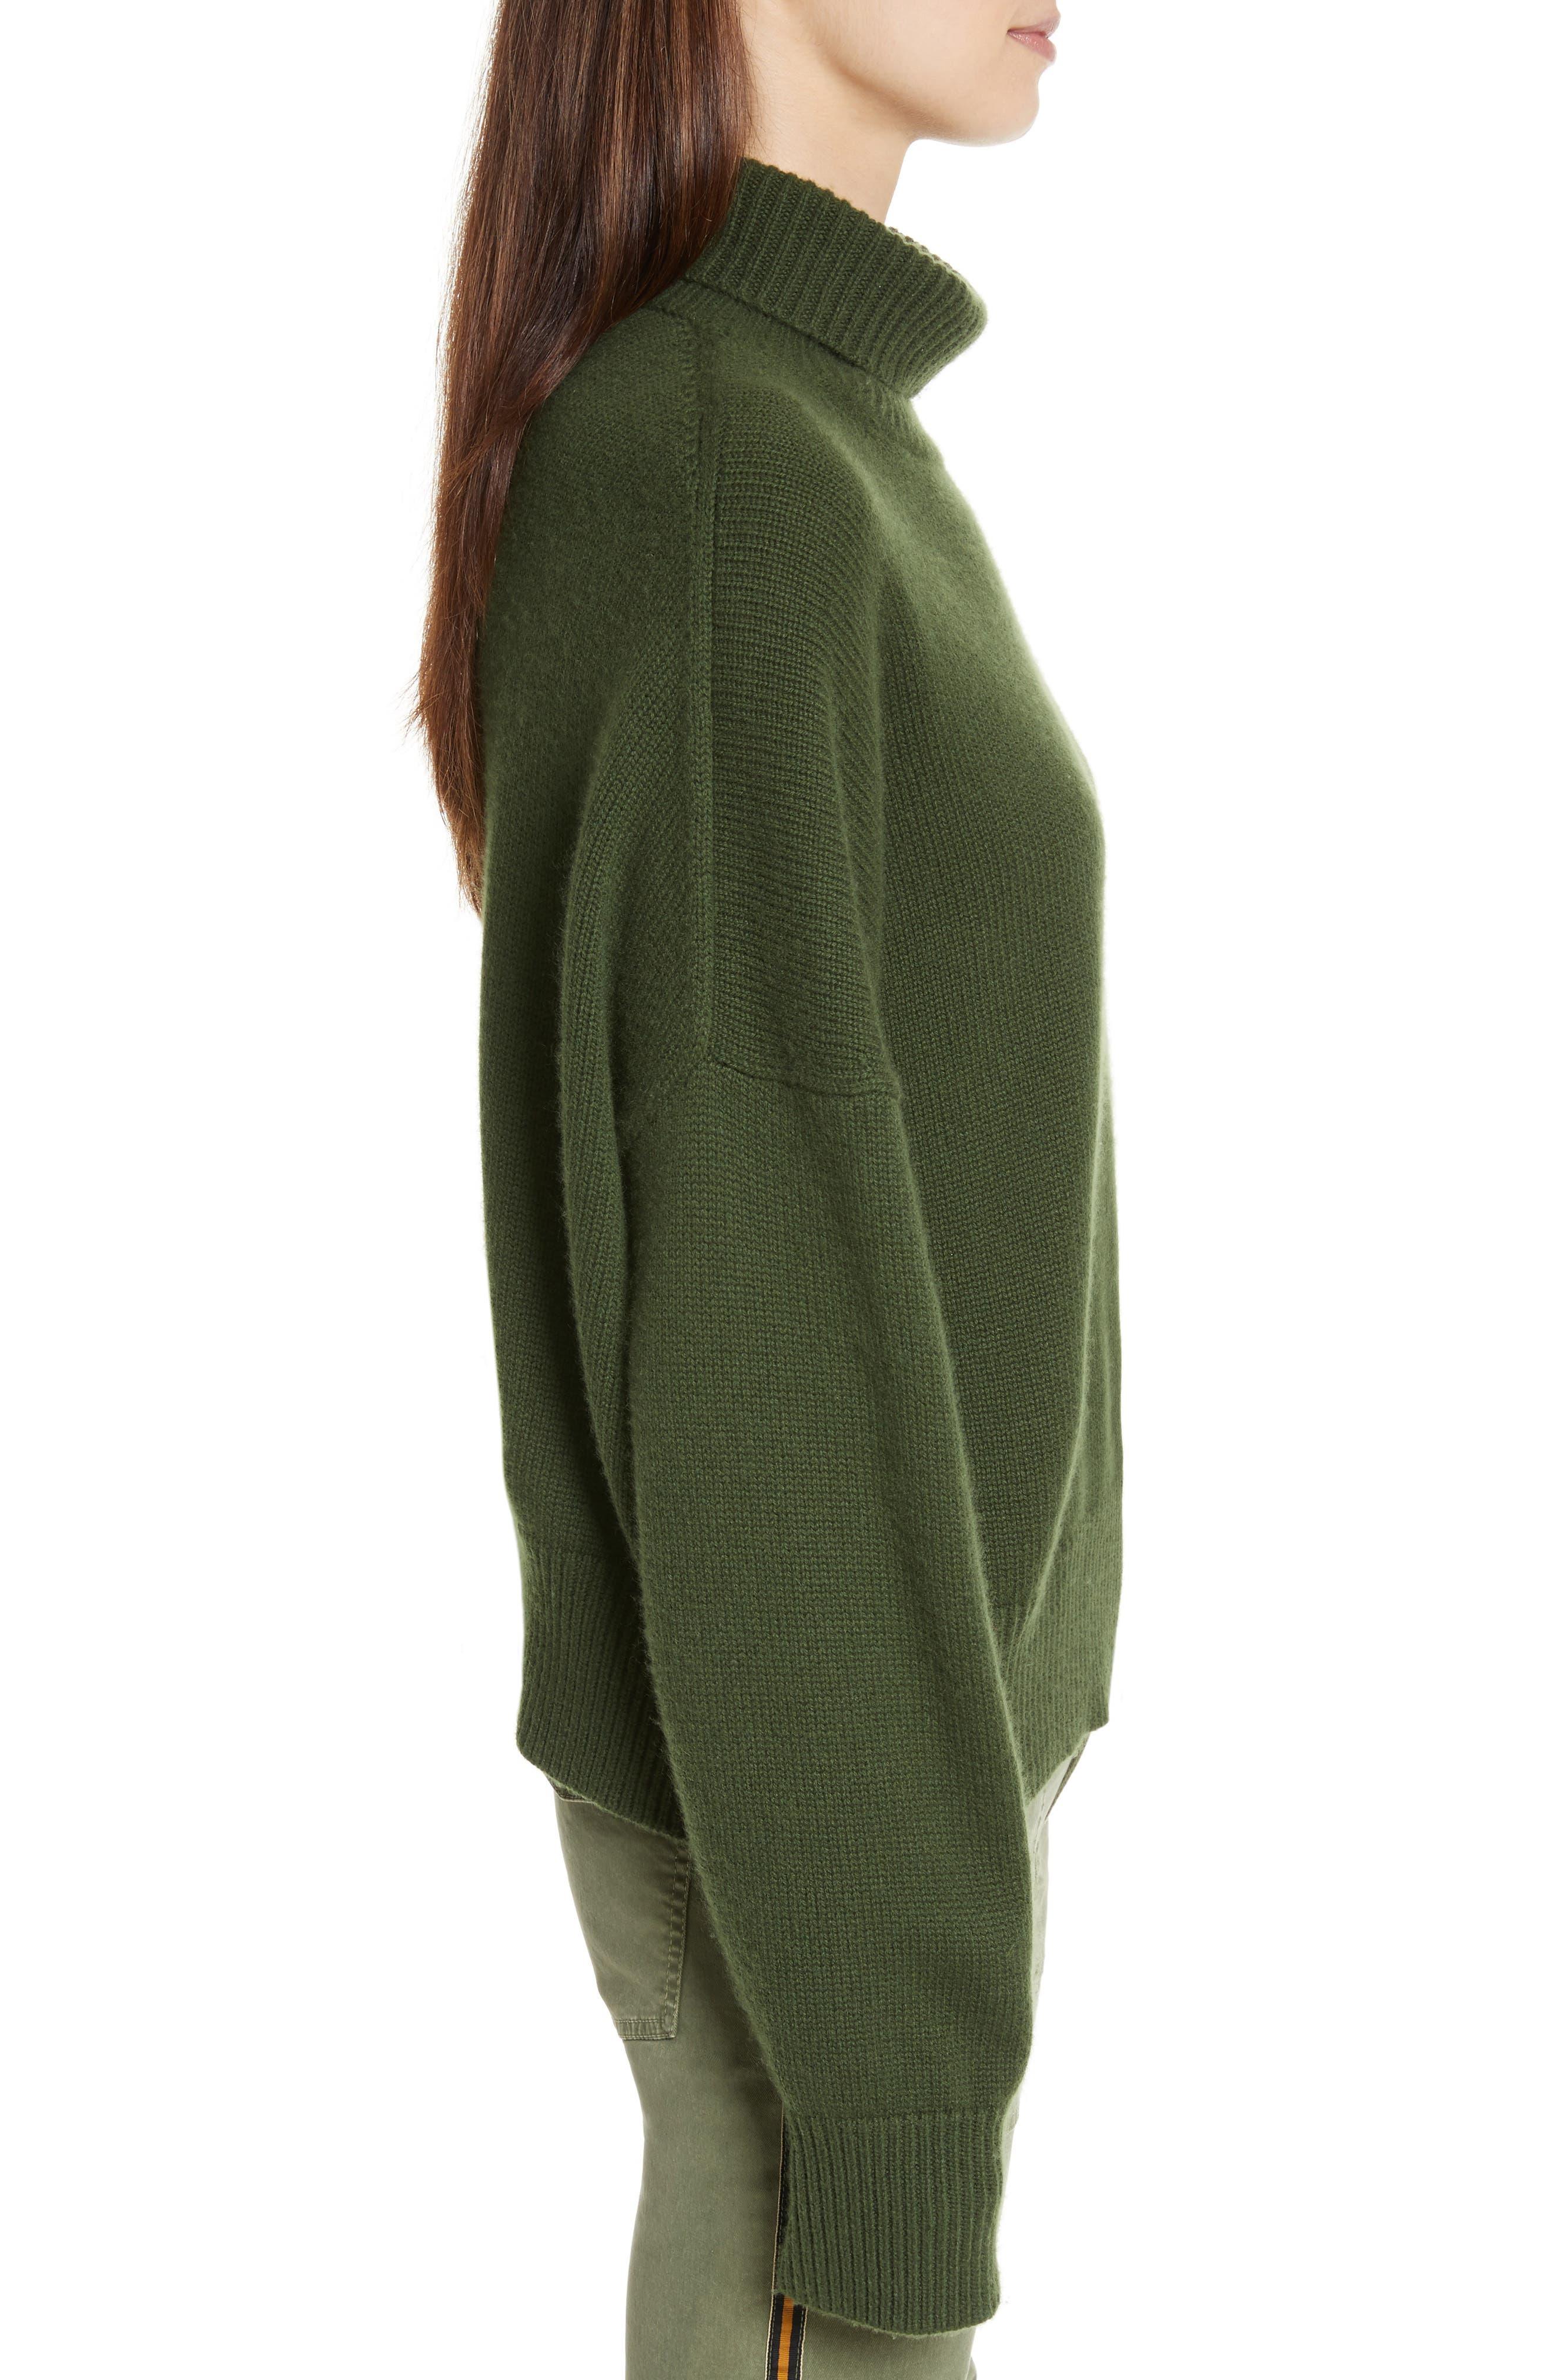 Serinda Wool & Cashmere Turtleneck Sweater,                             Alternate thumbnail 3, color,                             303